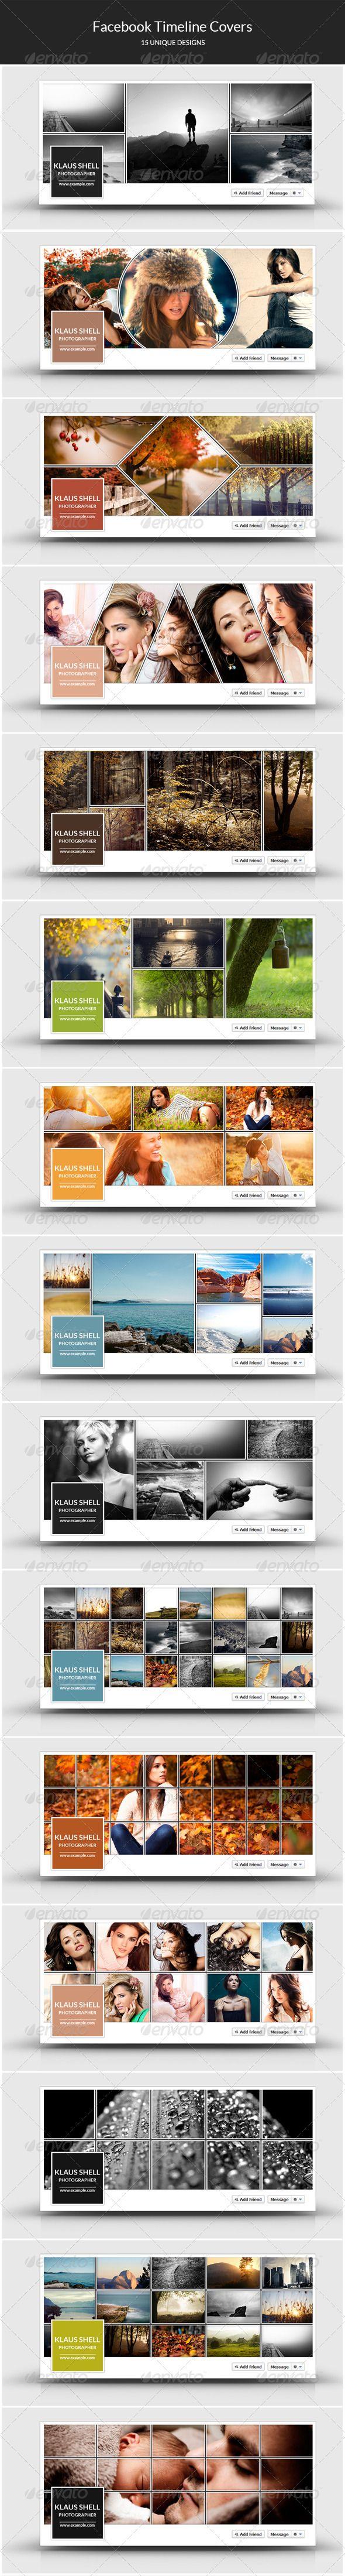 Facebook Timeline Covers - Facebook Timeline Covers Social Media http://www.socialmediabelle.com #socialmedia #Manager